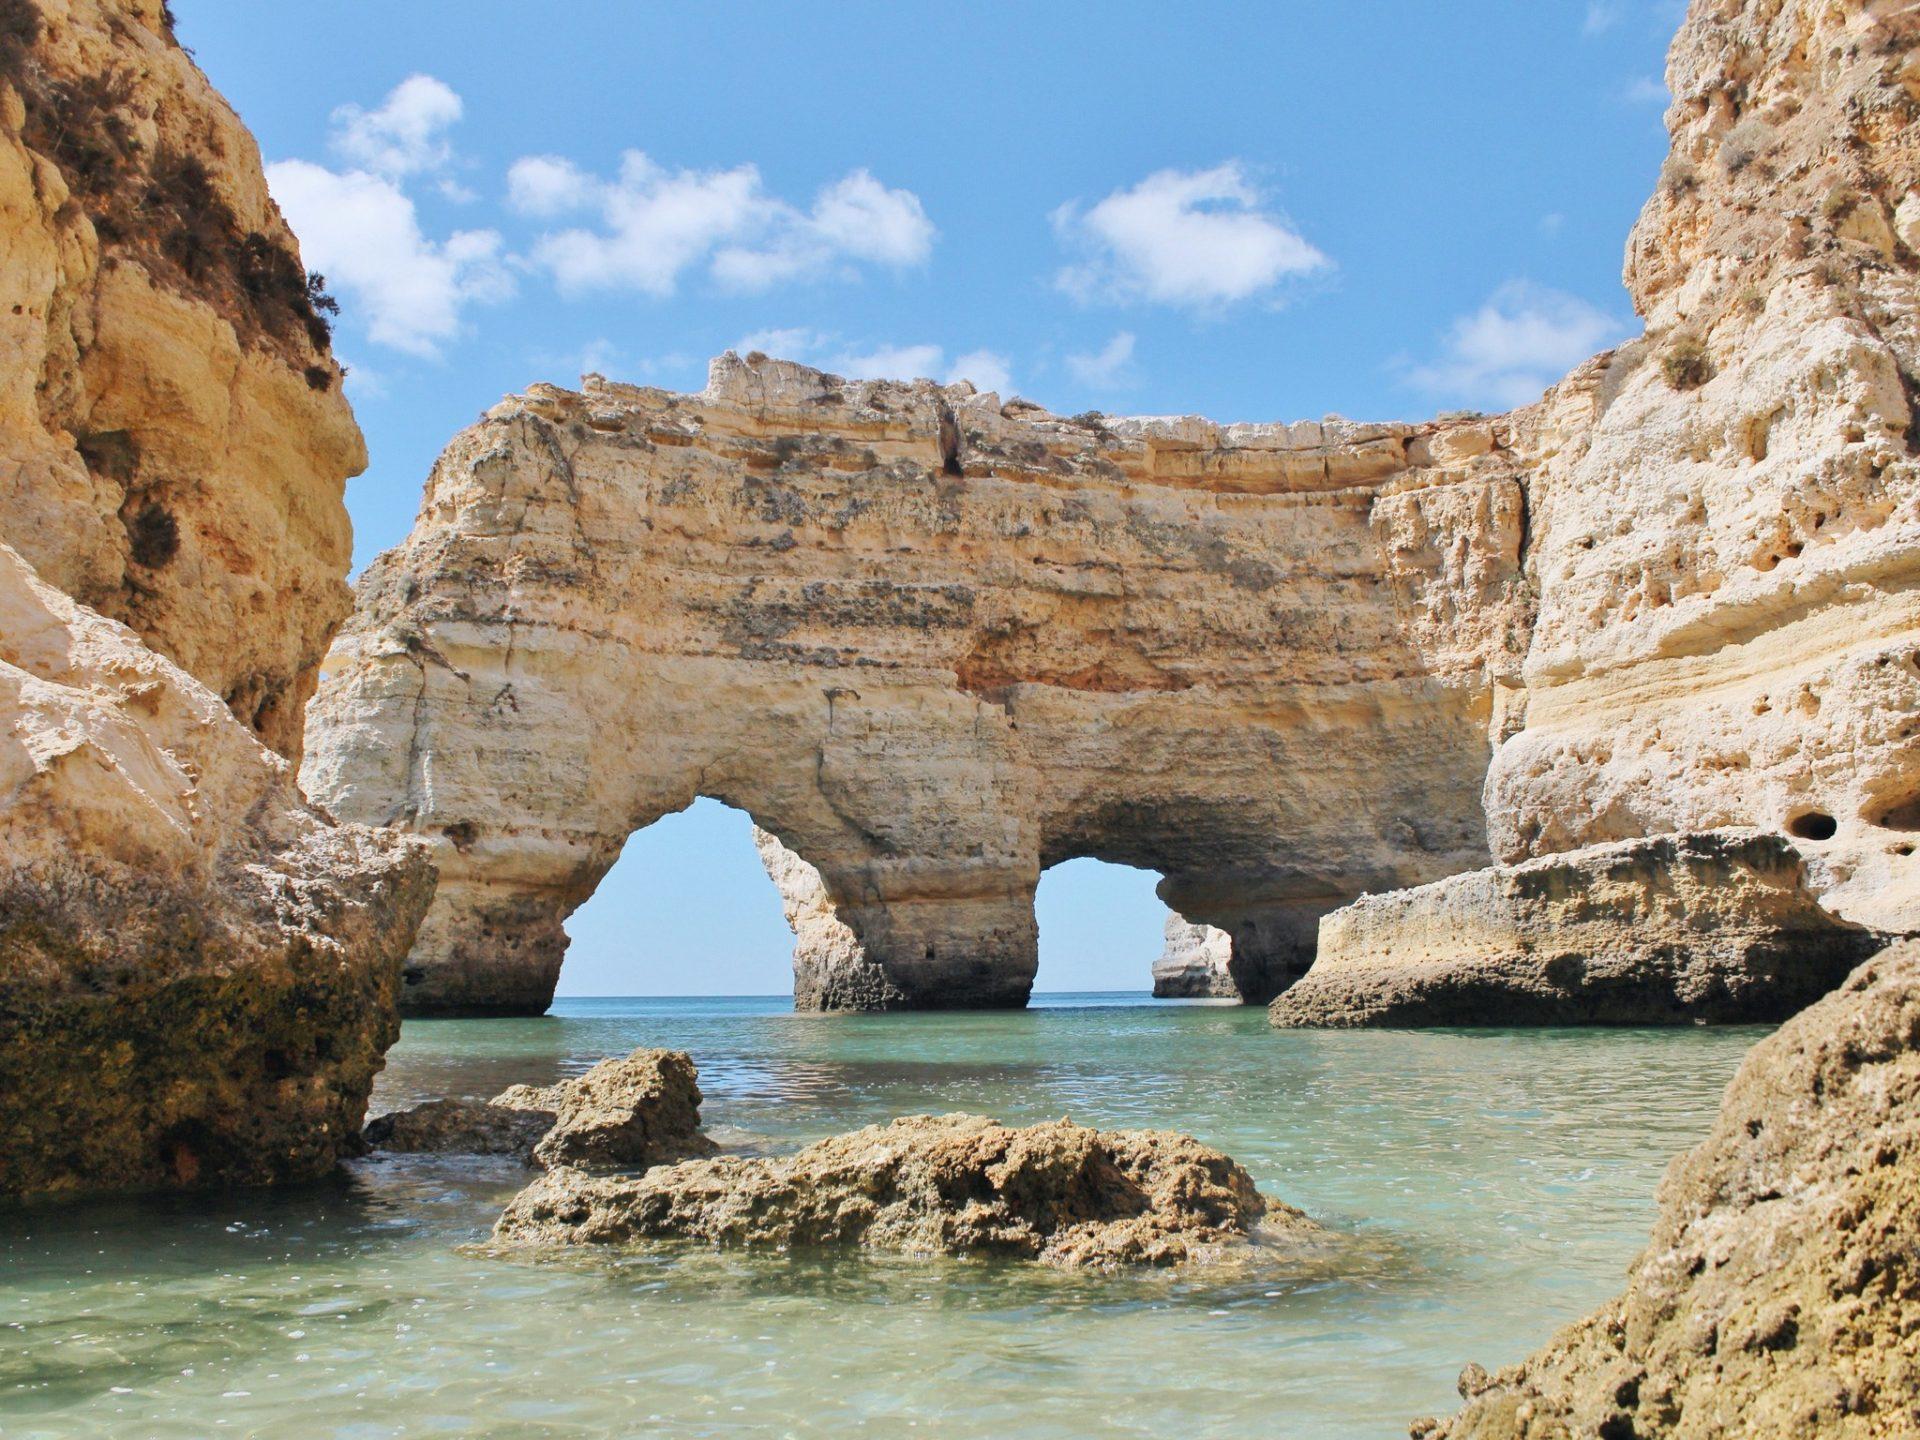 7. Пляж Прайа-де-Марина, Португалия.